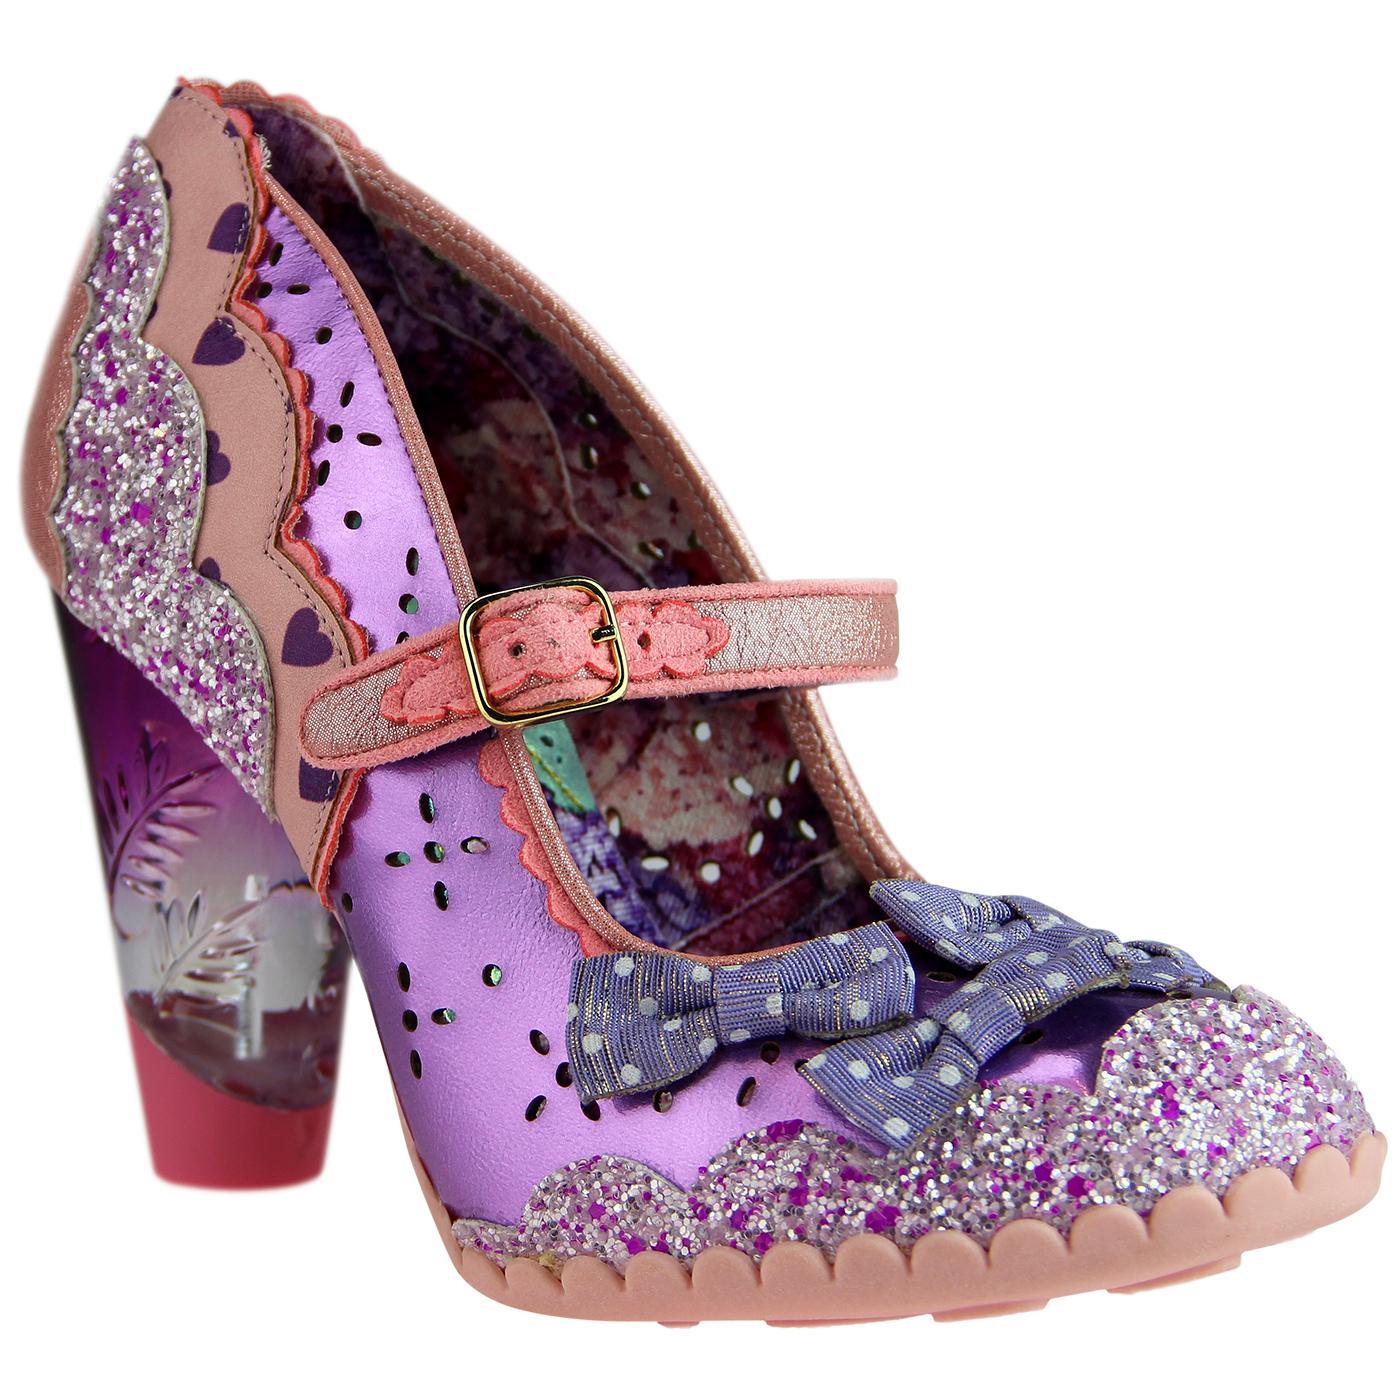 Shoependous IRREGULAR CHOICE Metallic Bow Heels P